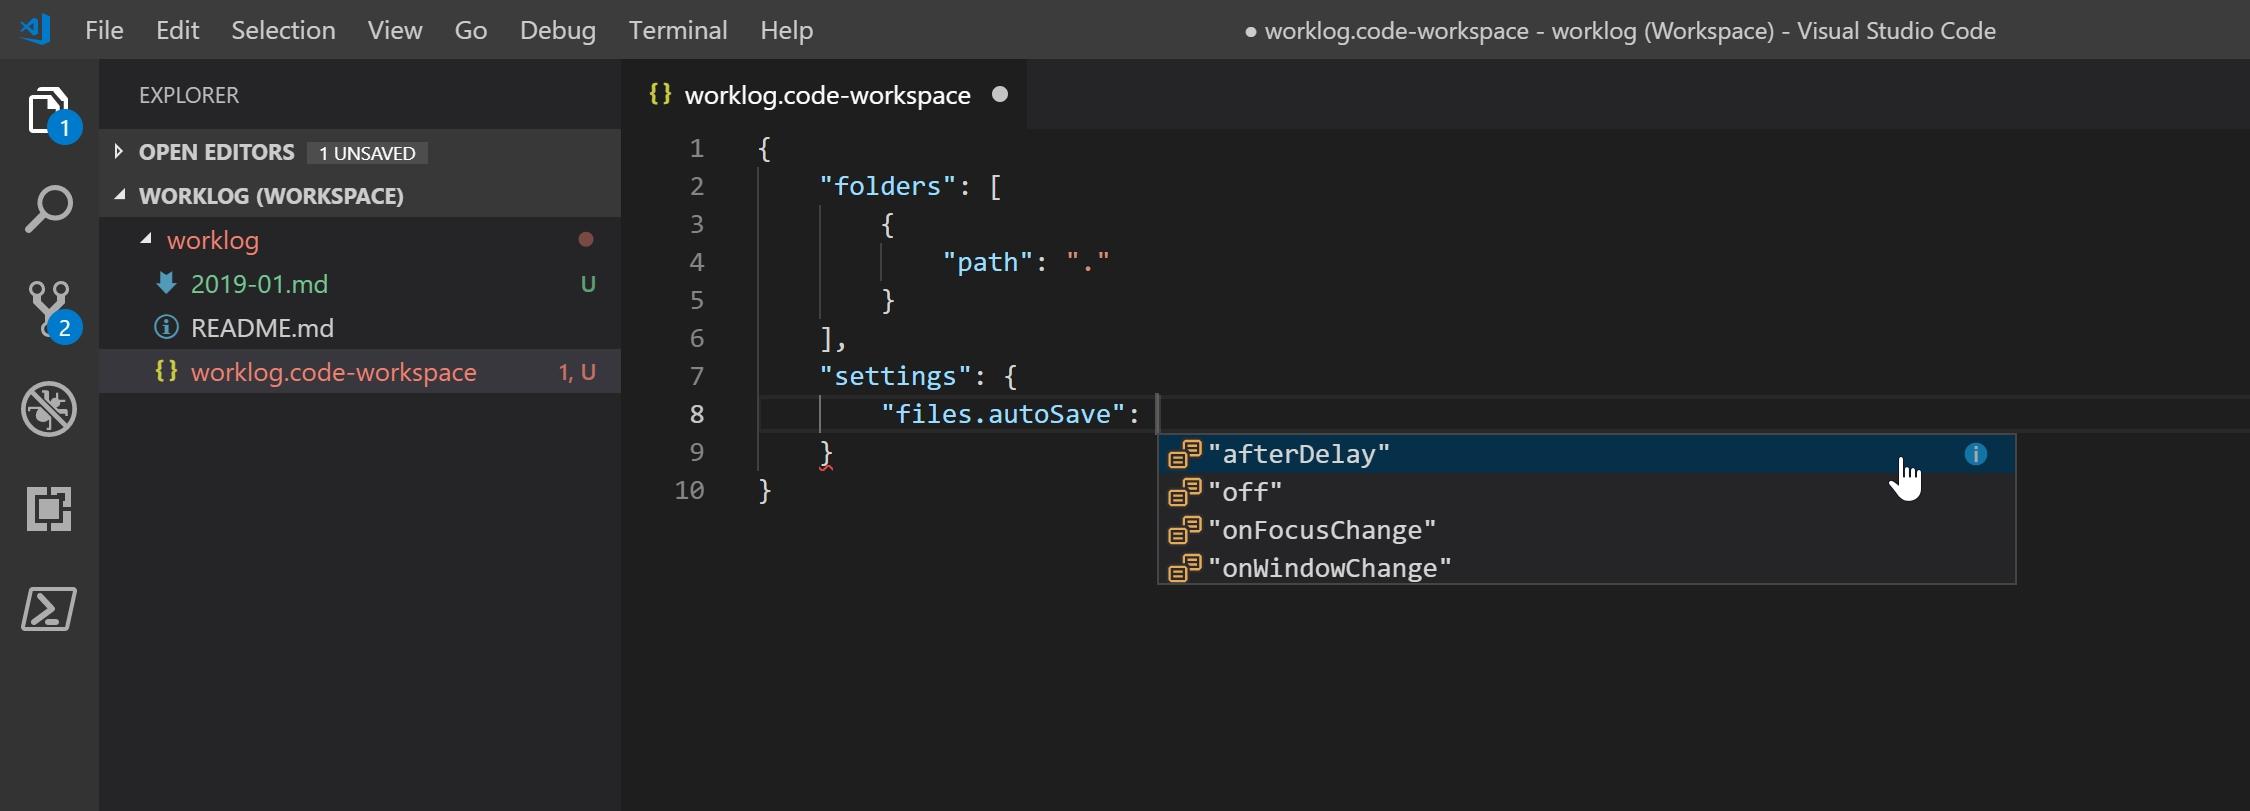 2019-01-12 10_48_27-● worklog.code-workspace - worklog (Workspace) - Visual Studio Code.jpg